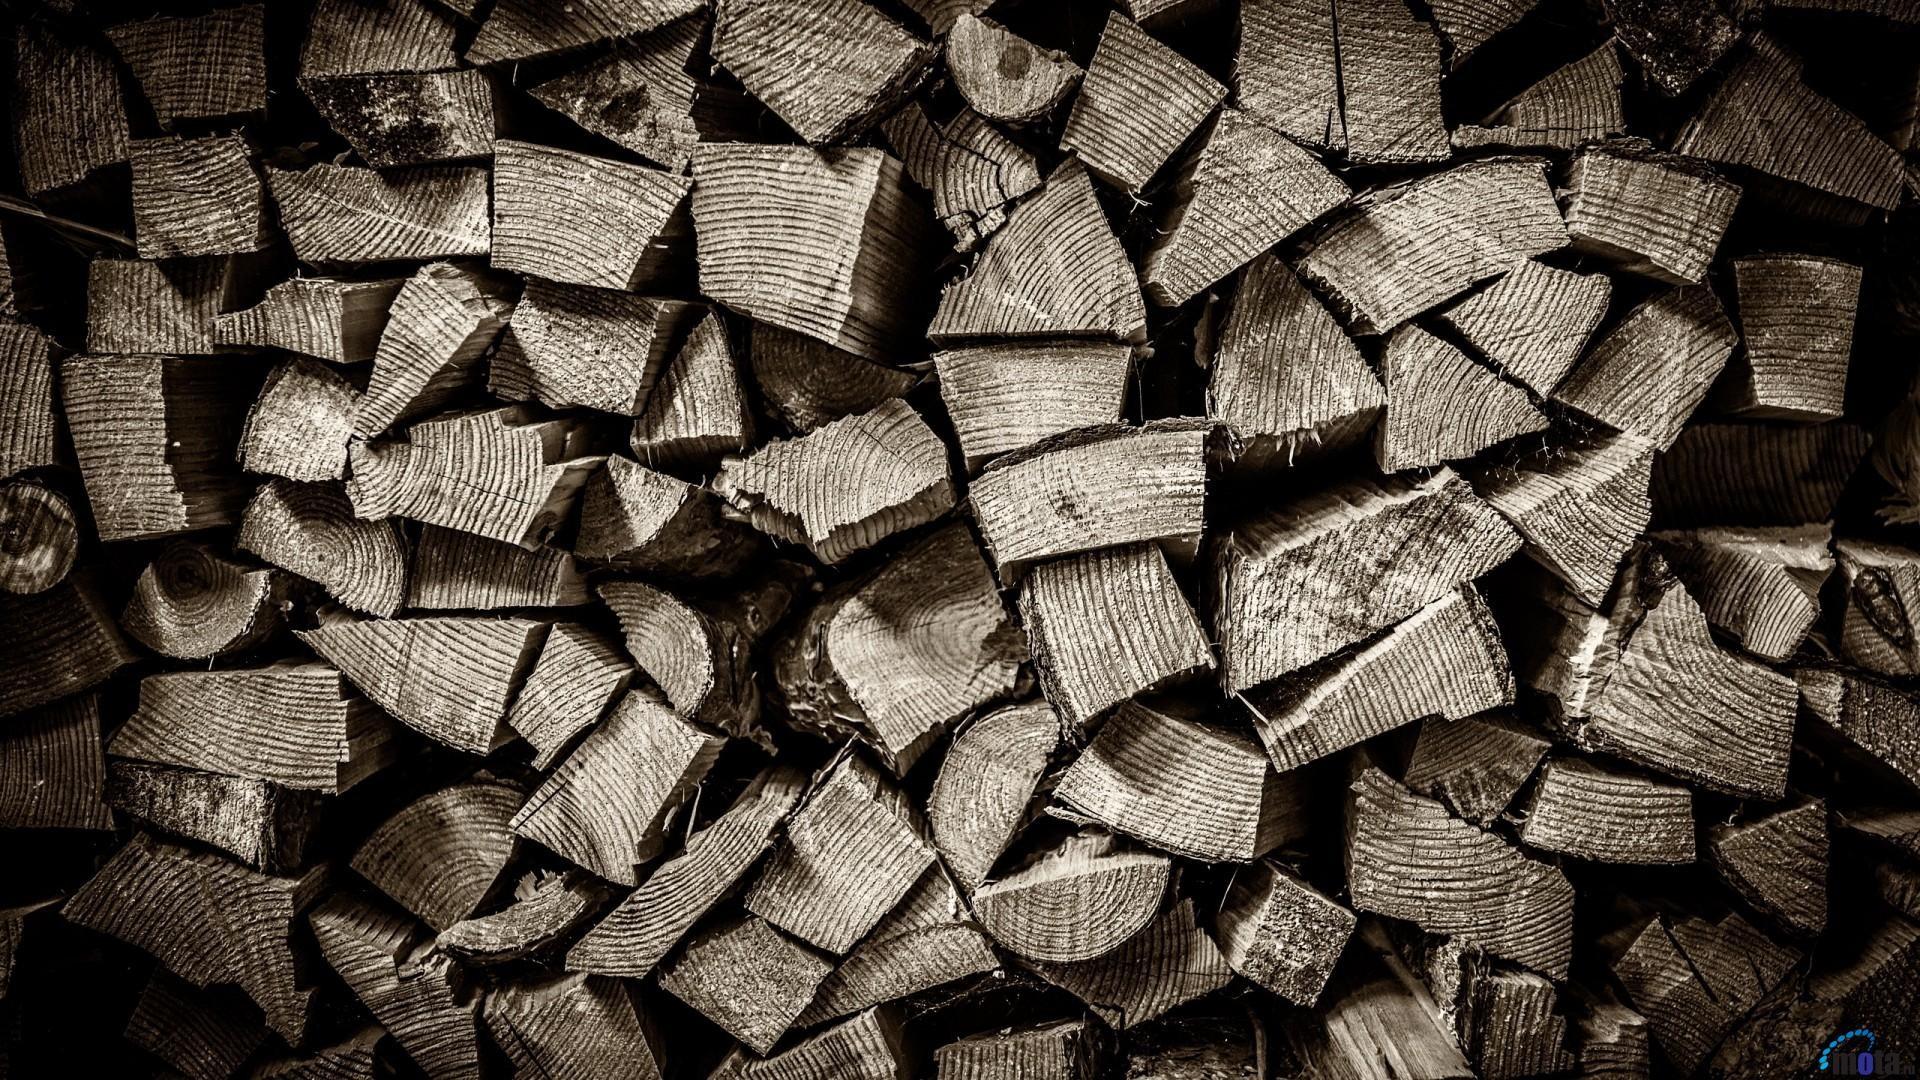 Res: 1920x1080, Download Wallpaper Wood pile (1920 x 1080 HDTV 1080p). Desktop .